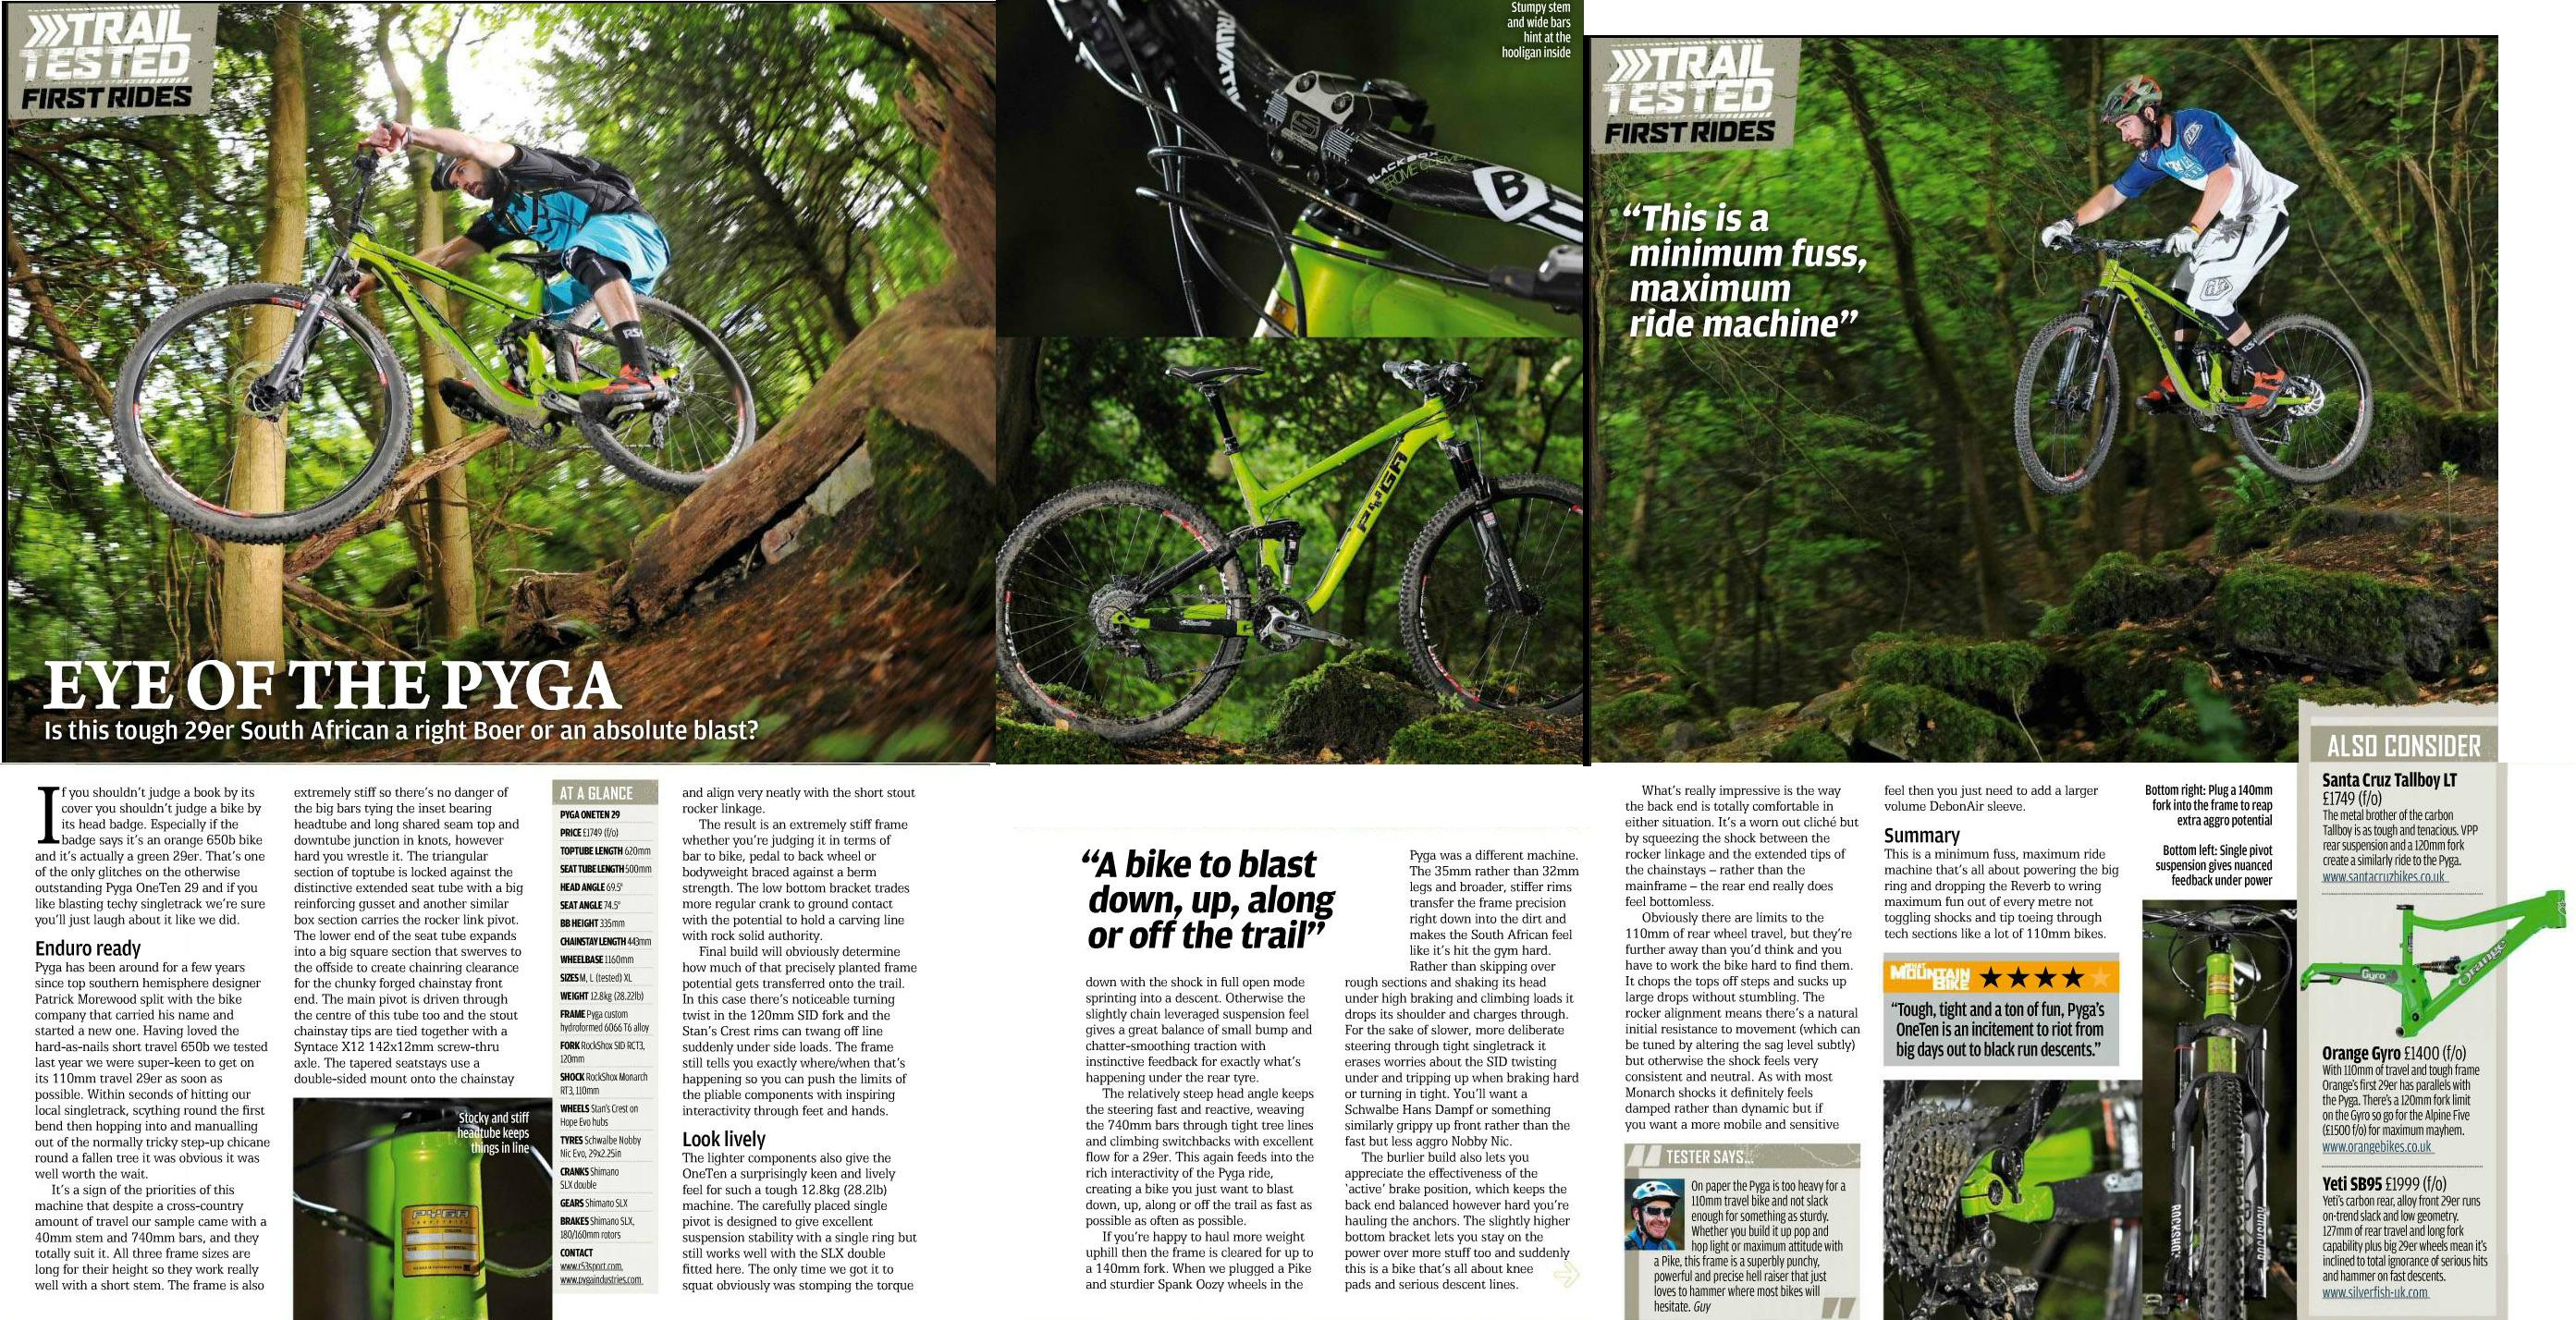 Pyga OneTen 29er review - What Mountain Bike Mag